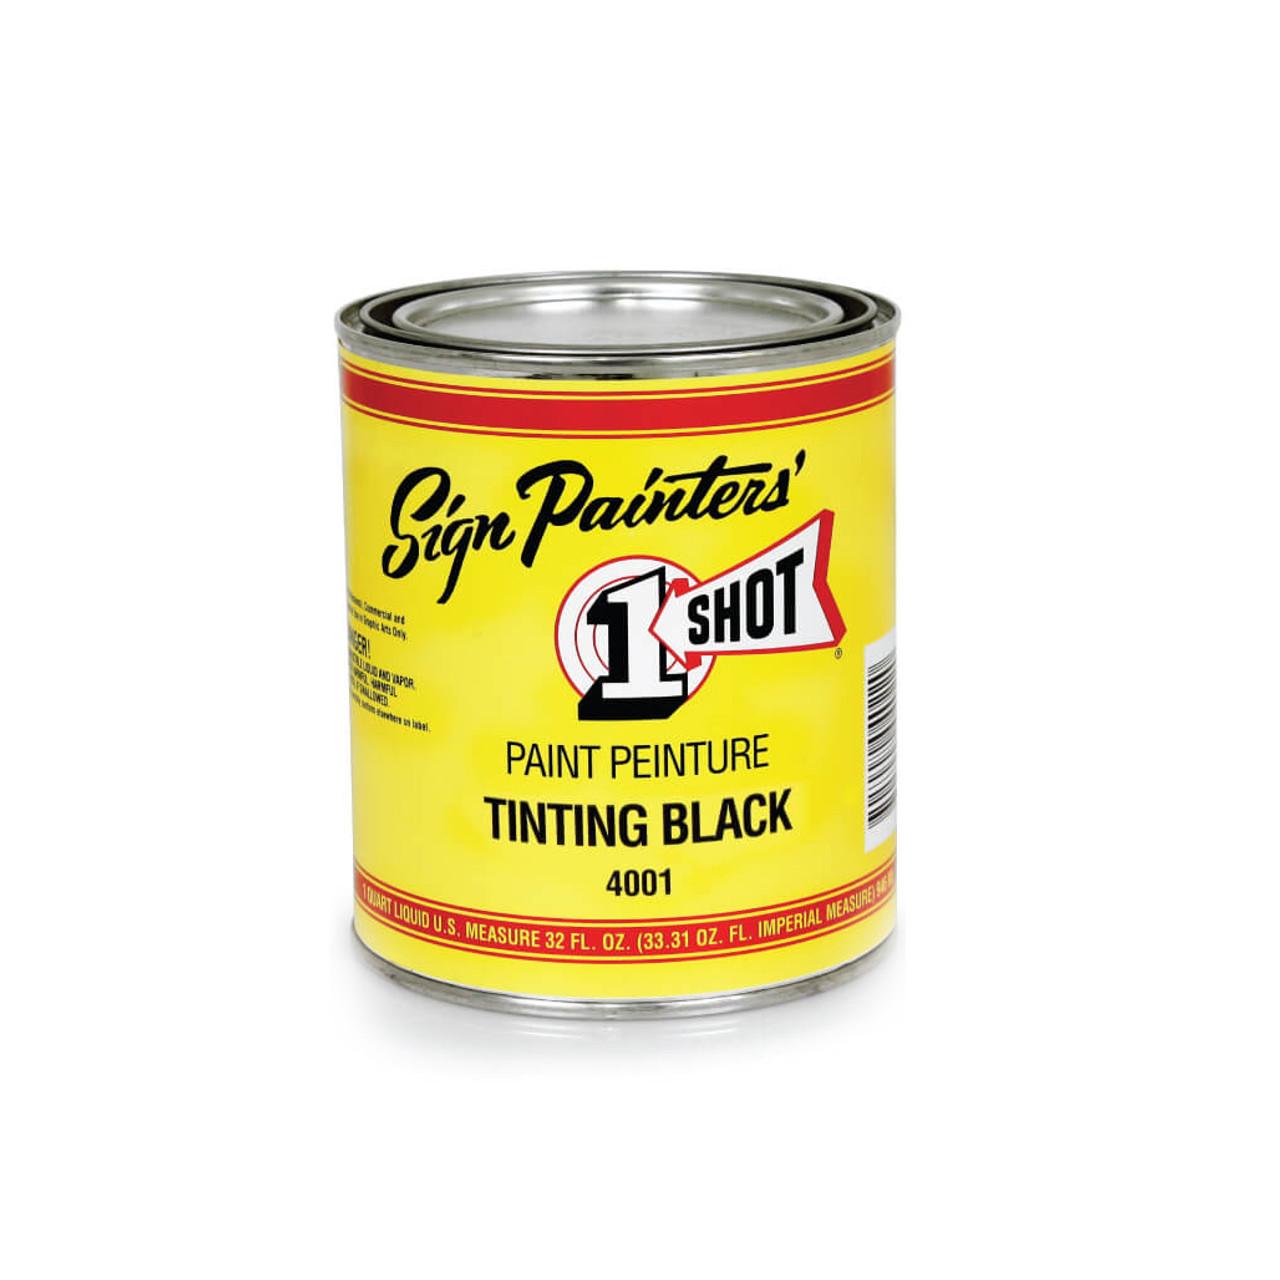 1-Shot Tinting Black